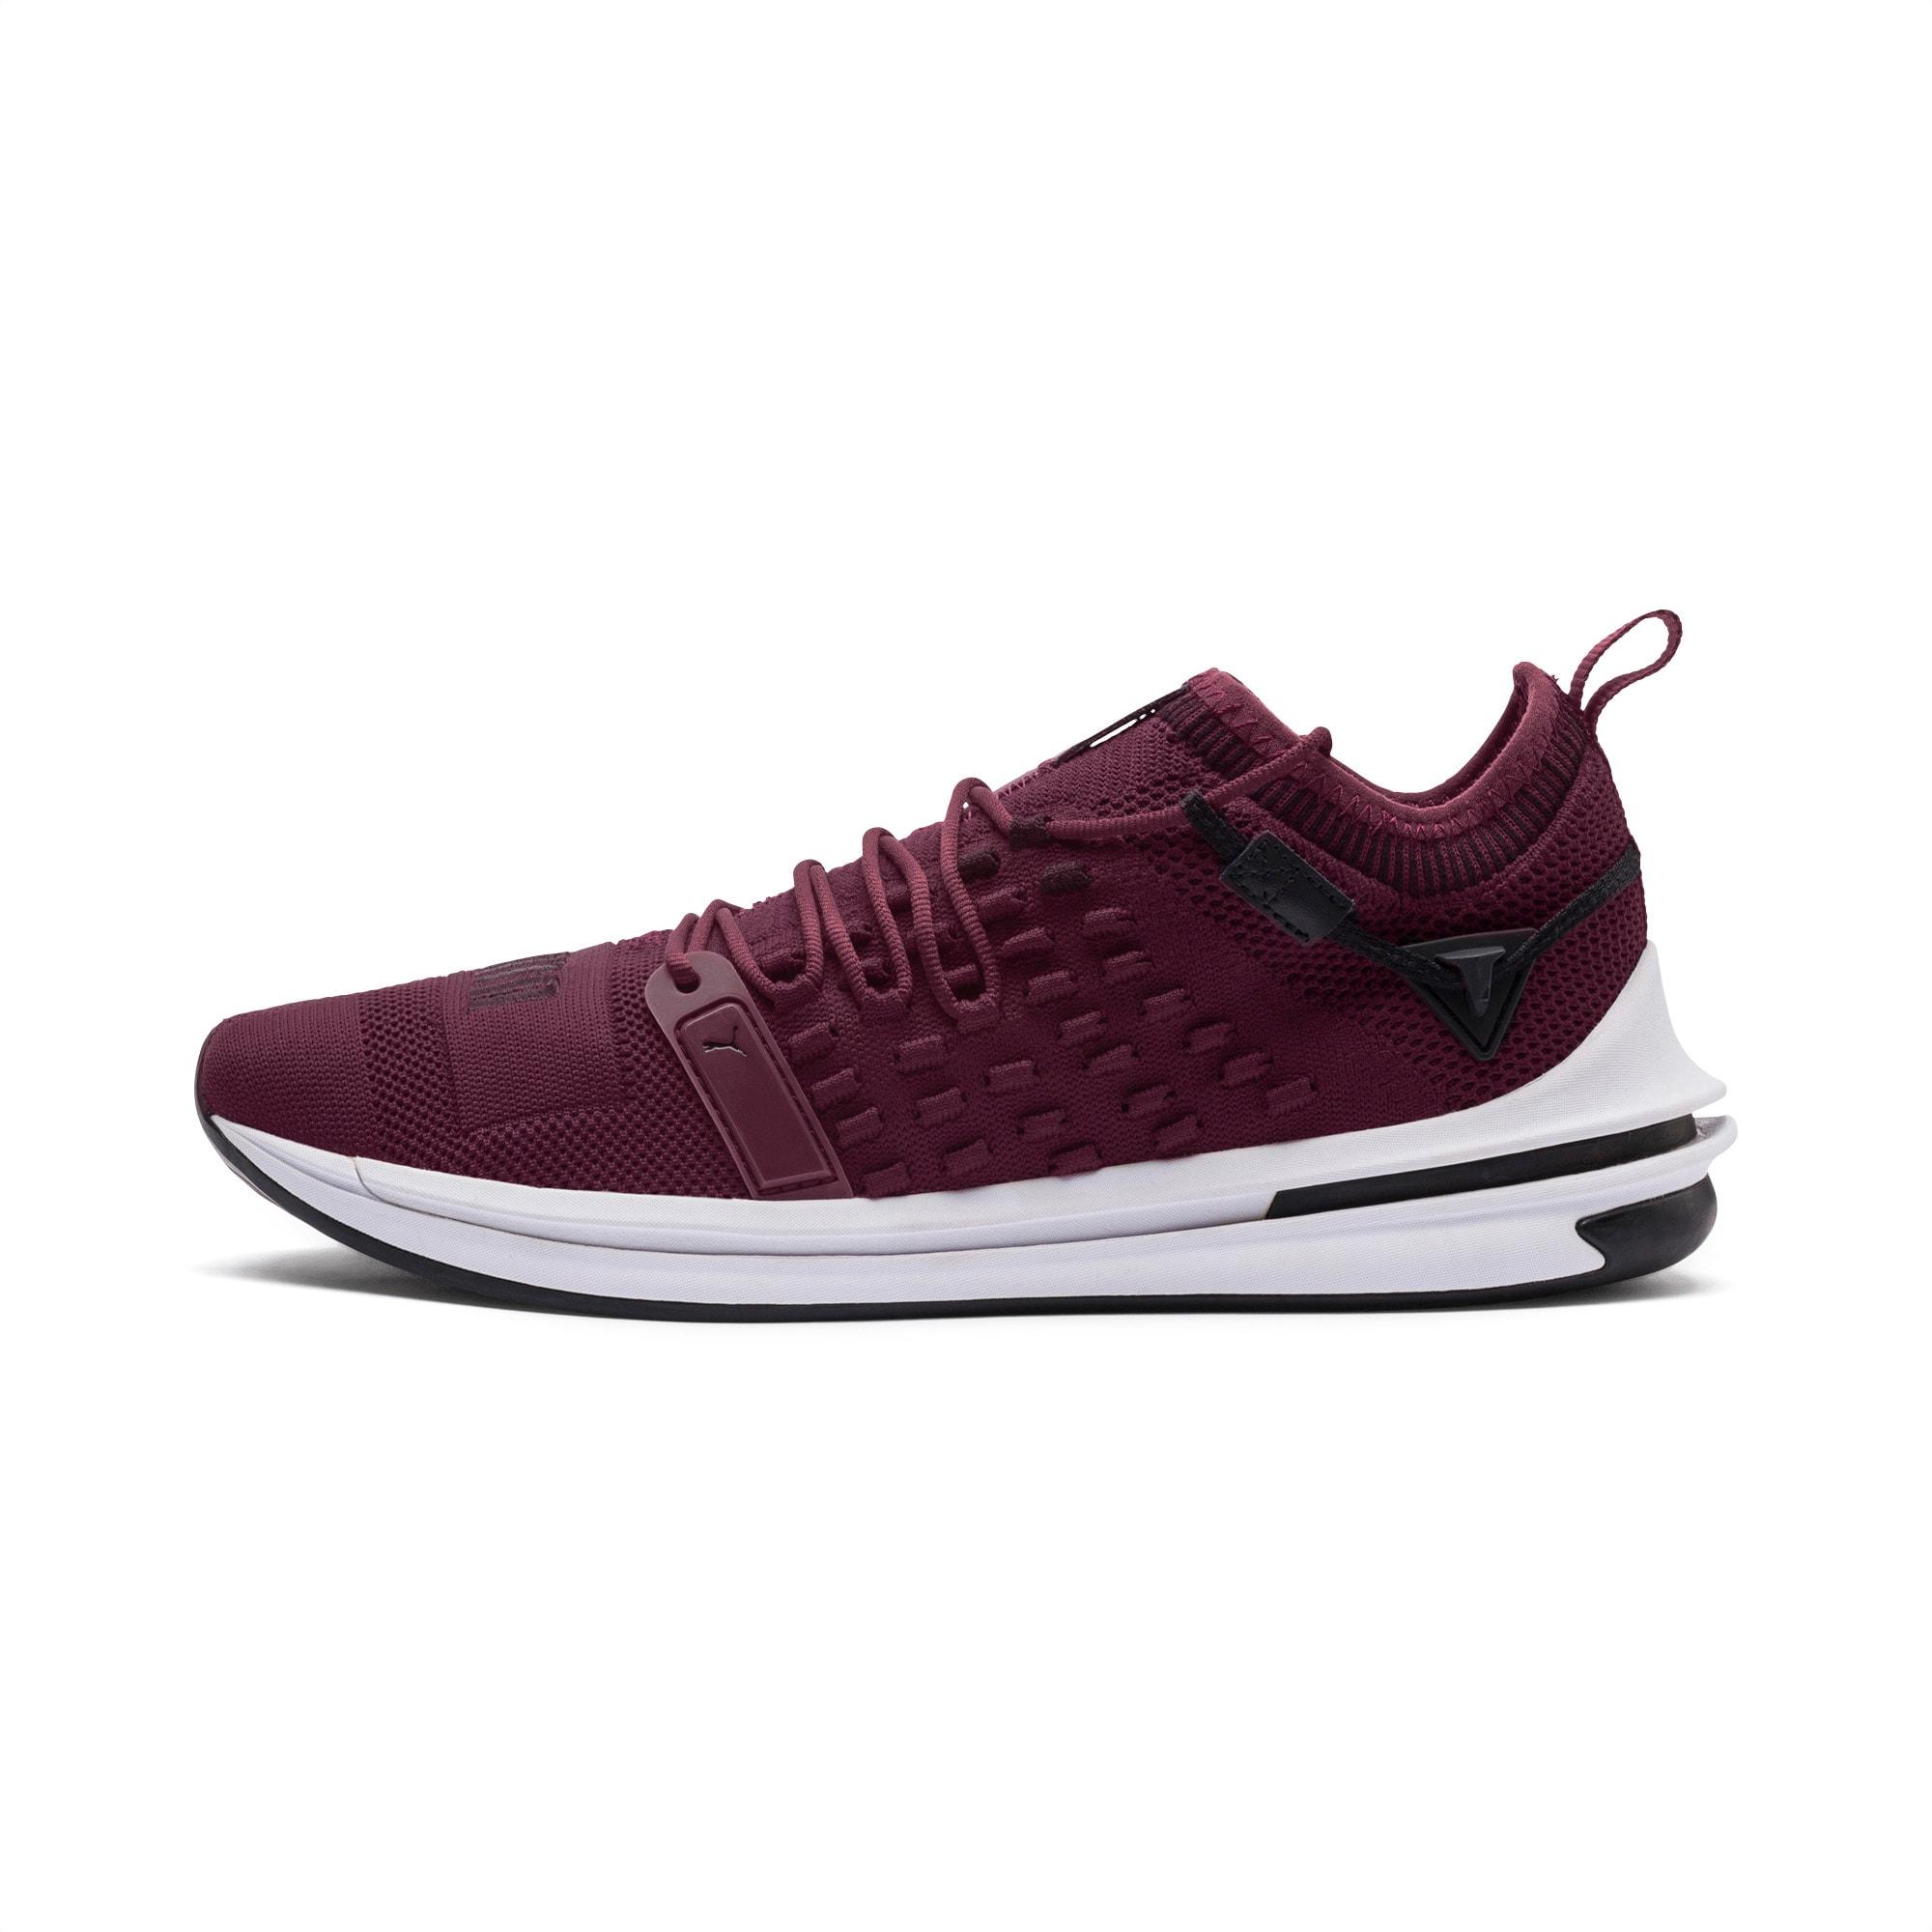 IGNITE Limitless SR FUSEFIT Running Shoes   PUMA Sale   PUMA